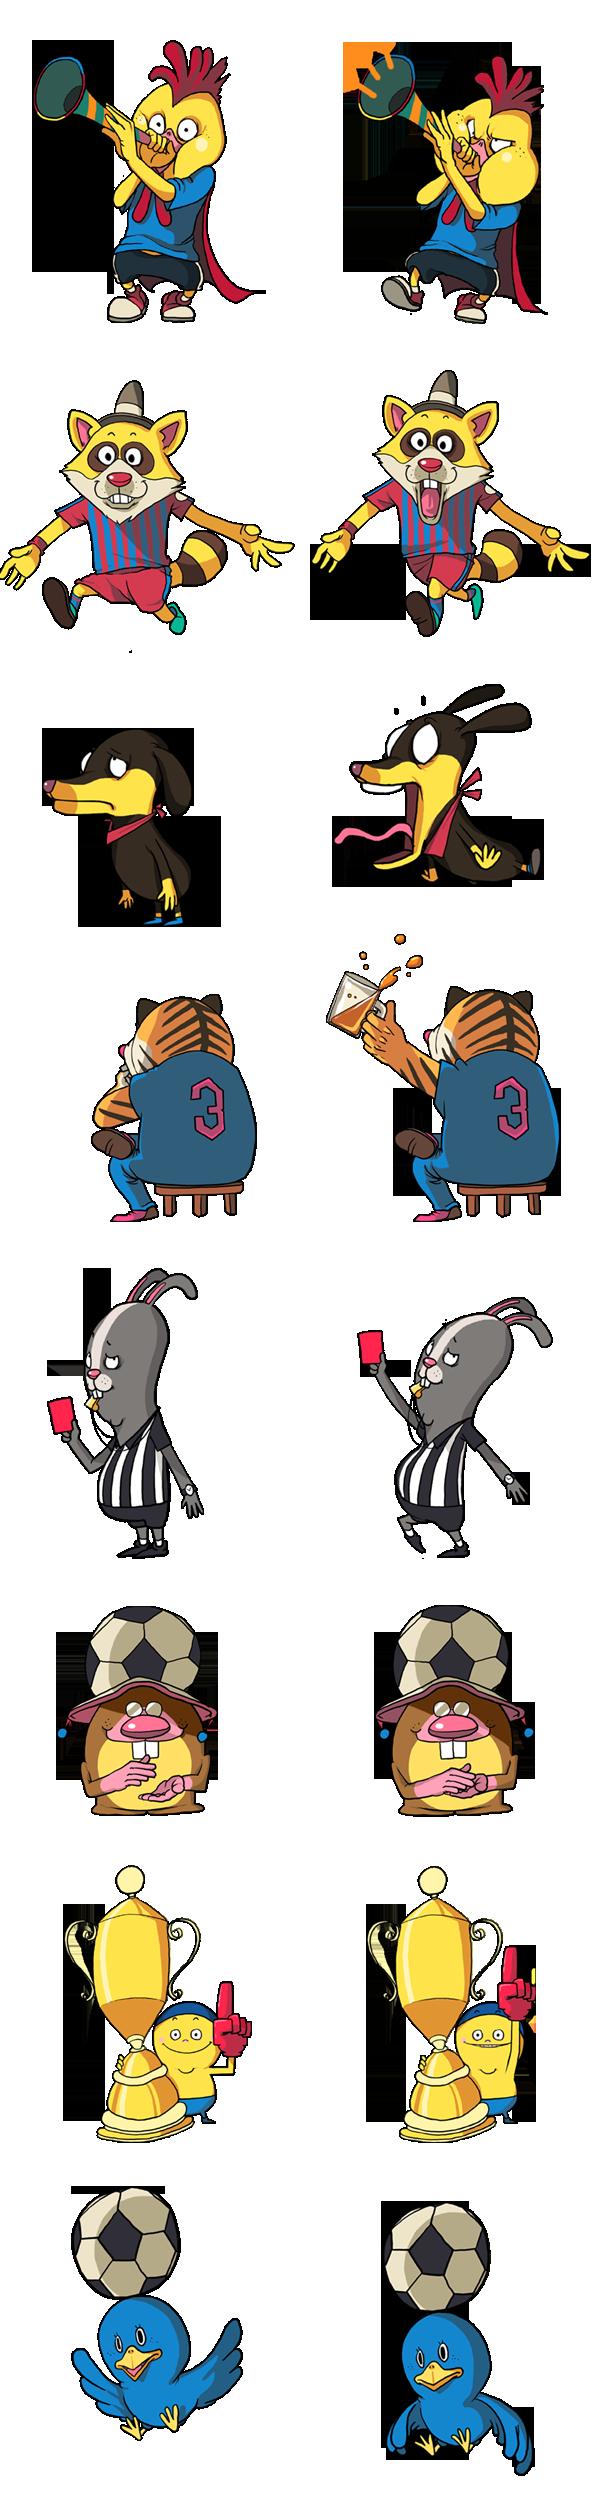 Special-Animal-Olympic-Sakiroo-Choi  (2)